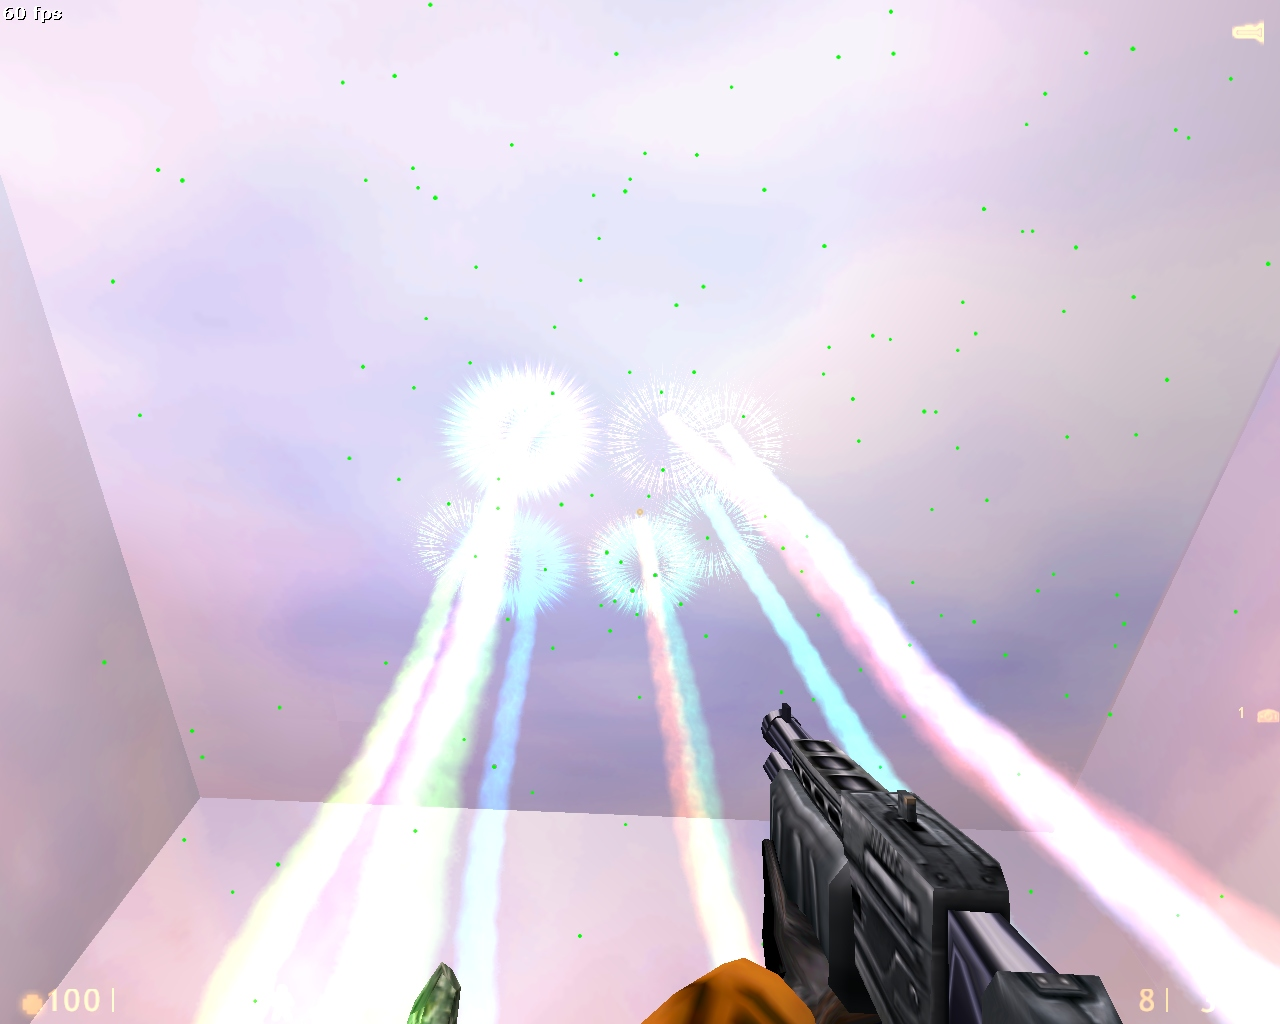 hq_firstblood0011.jpg - Half-Life